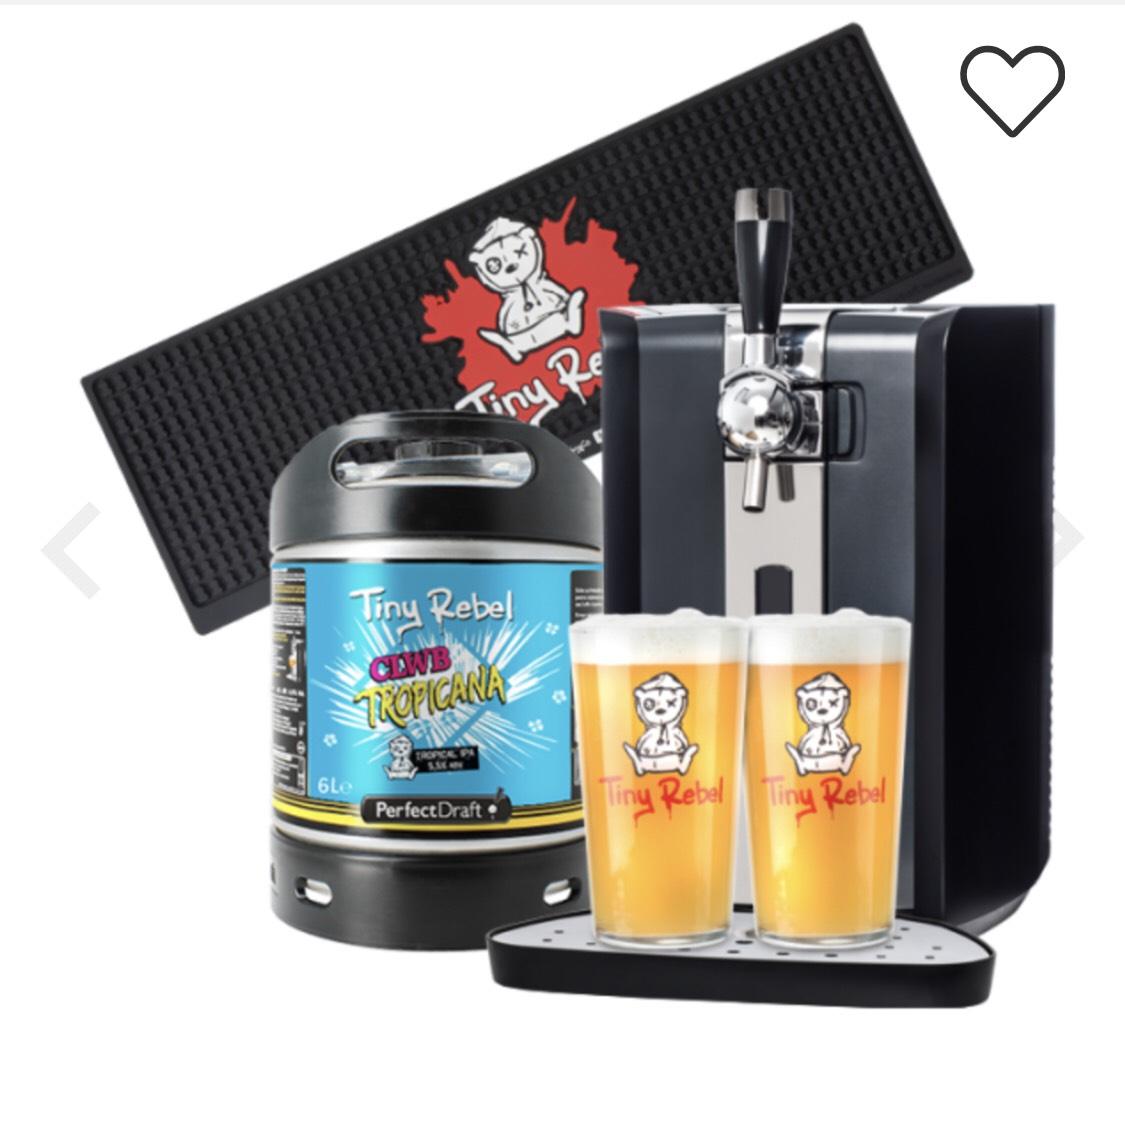 Perfect draft Tiny rebel starter bundle at Beerhawk for £199